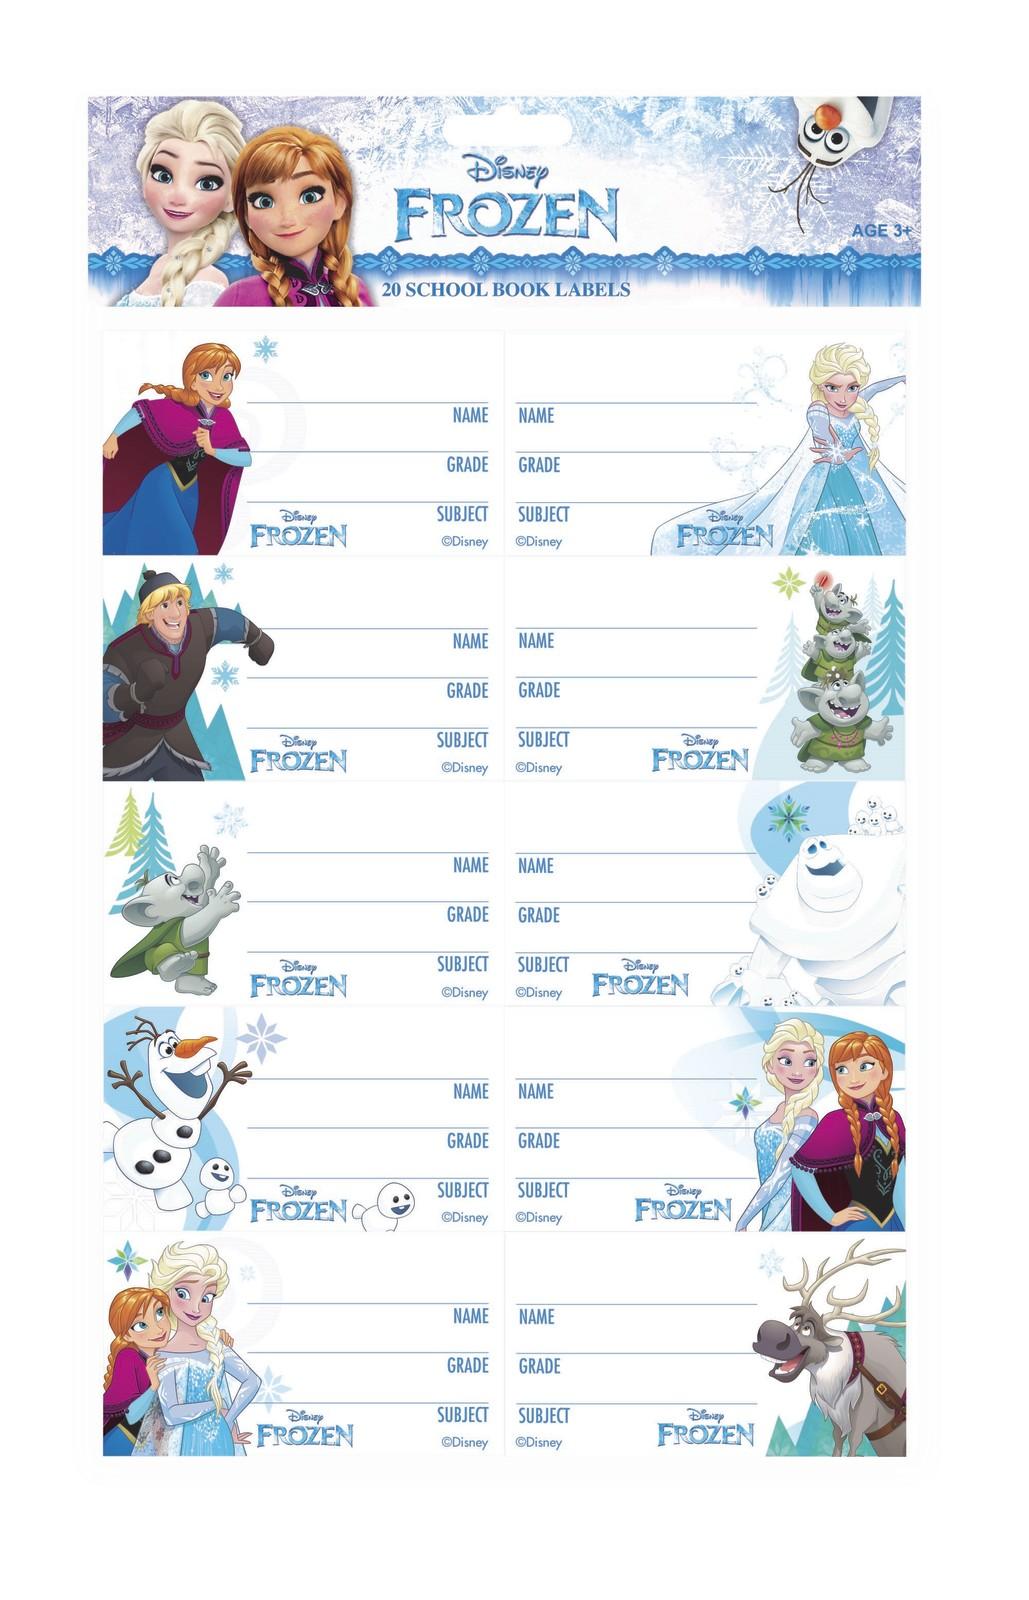 Disney Frozen Book Labels image